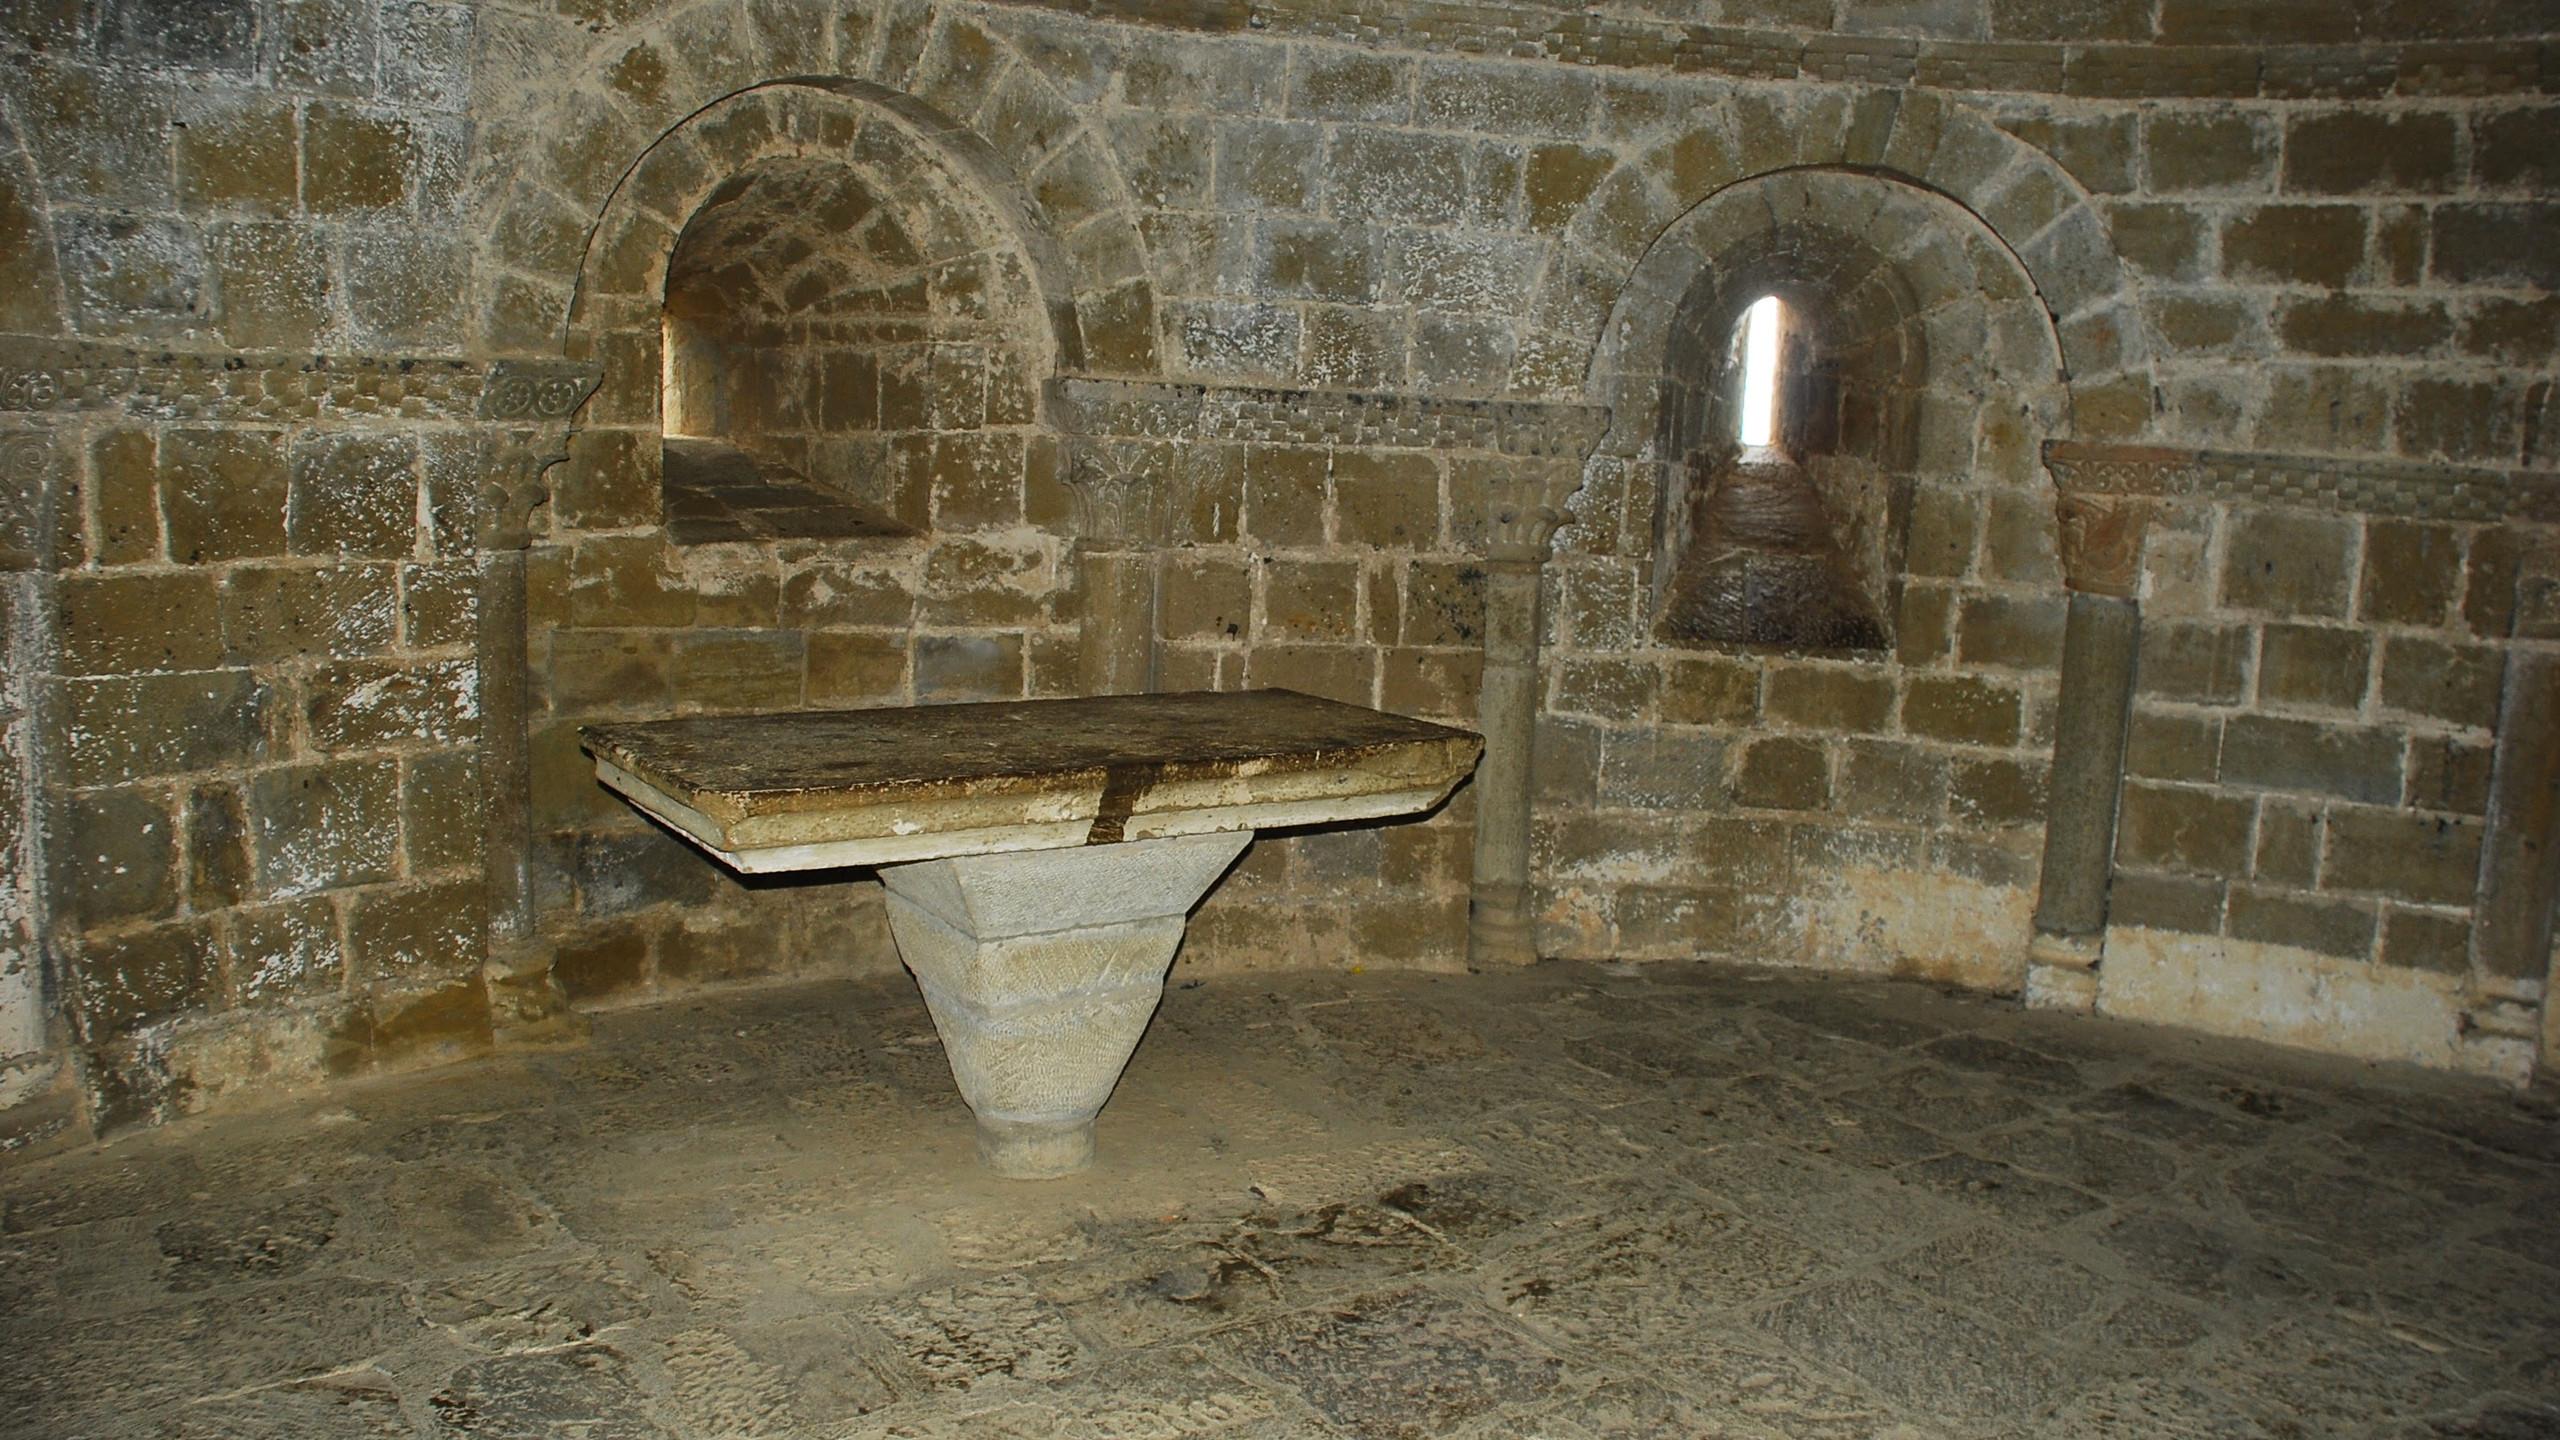 Castillo de Loarre - 45